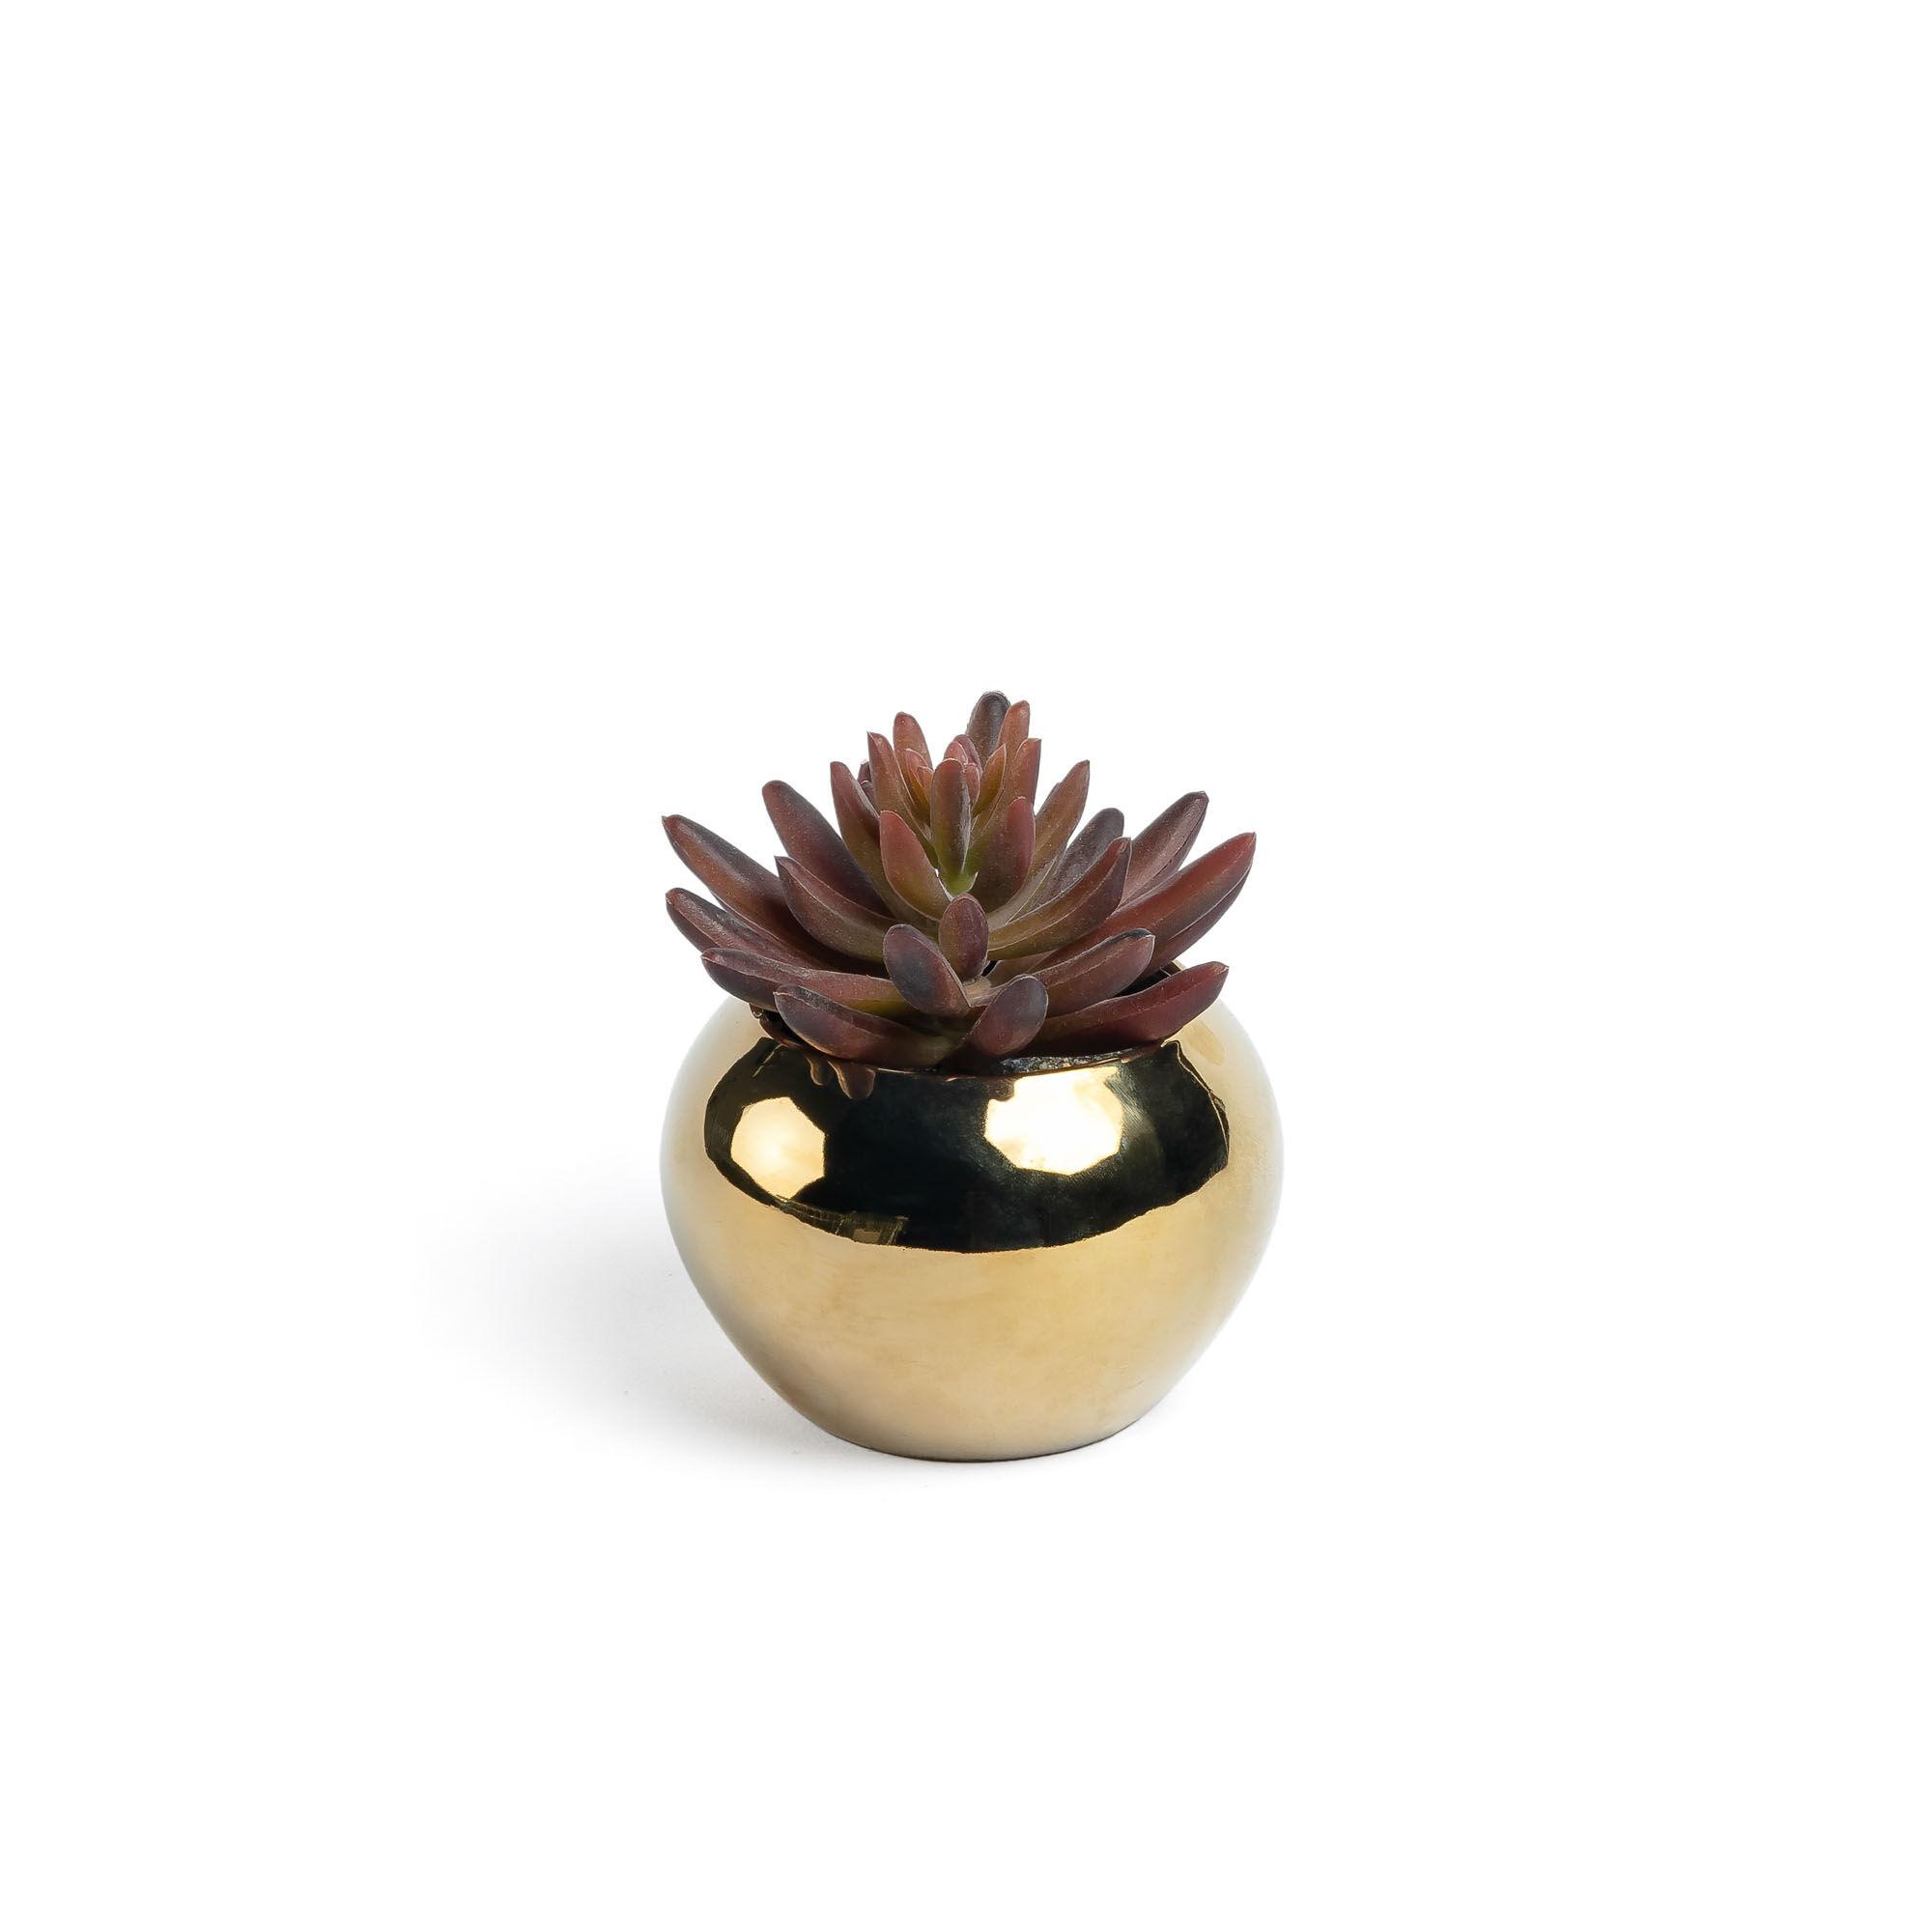 kave home pianta artificiale sedum lucidum in un vaso da creramica dorato